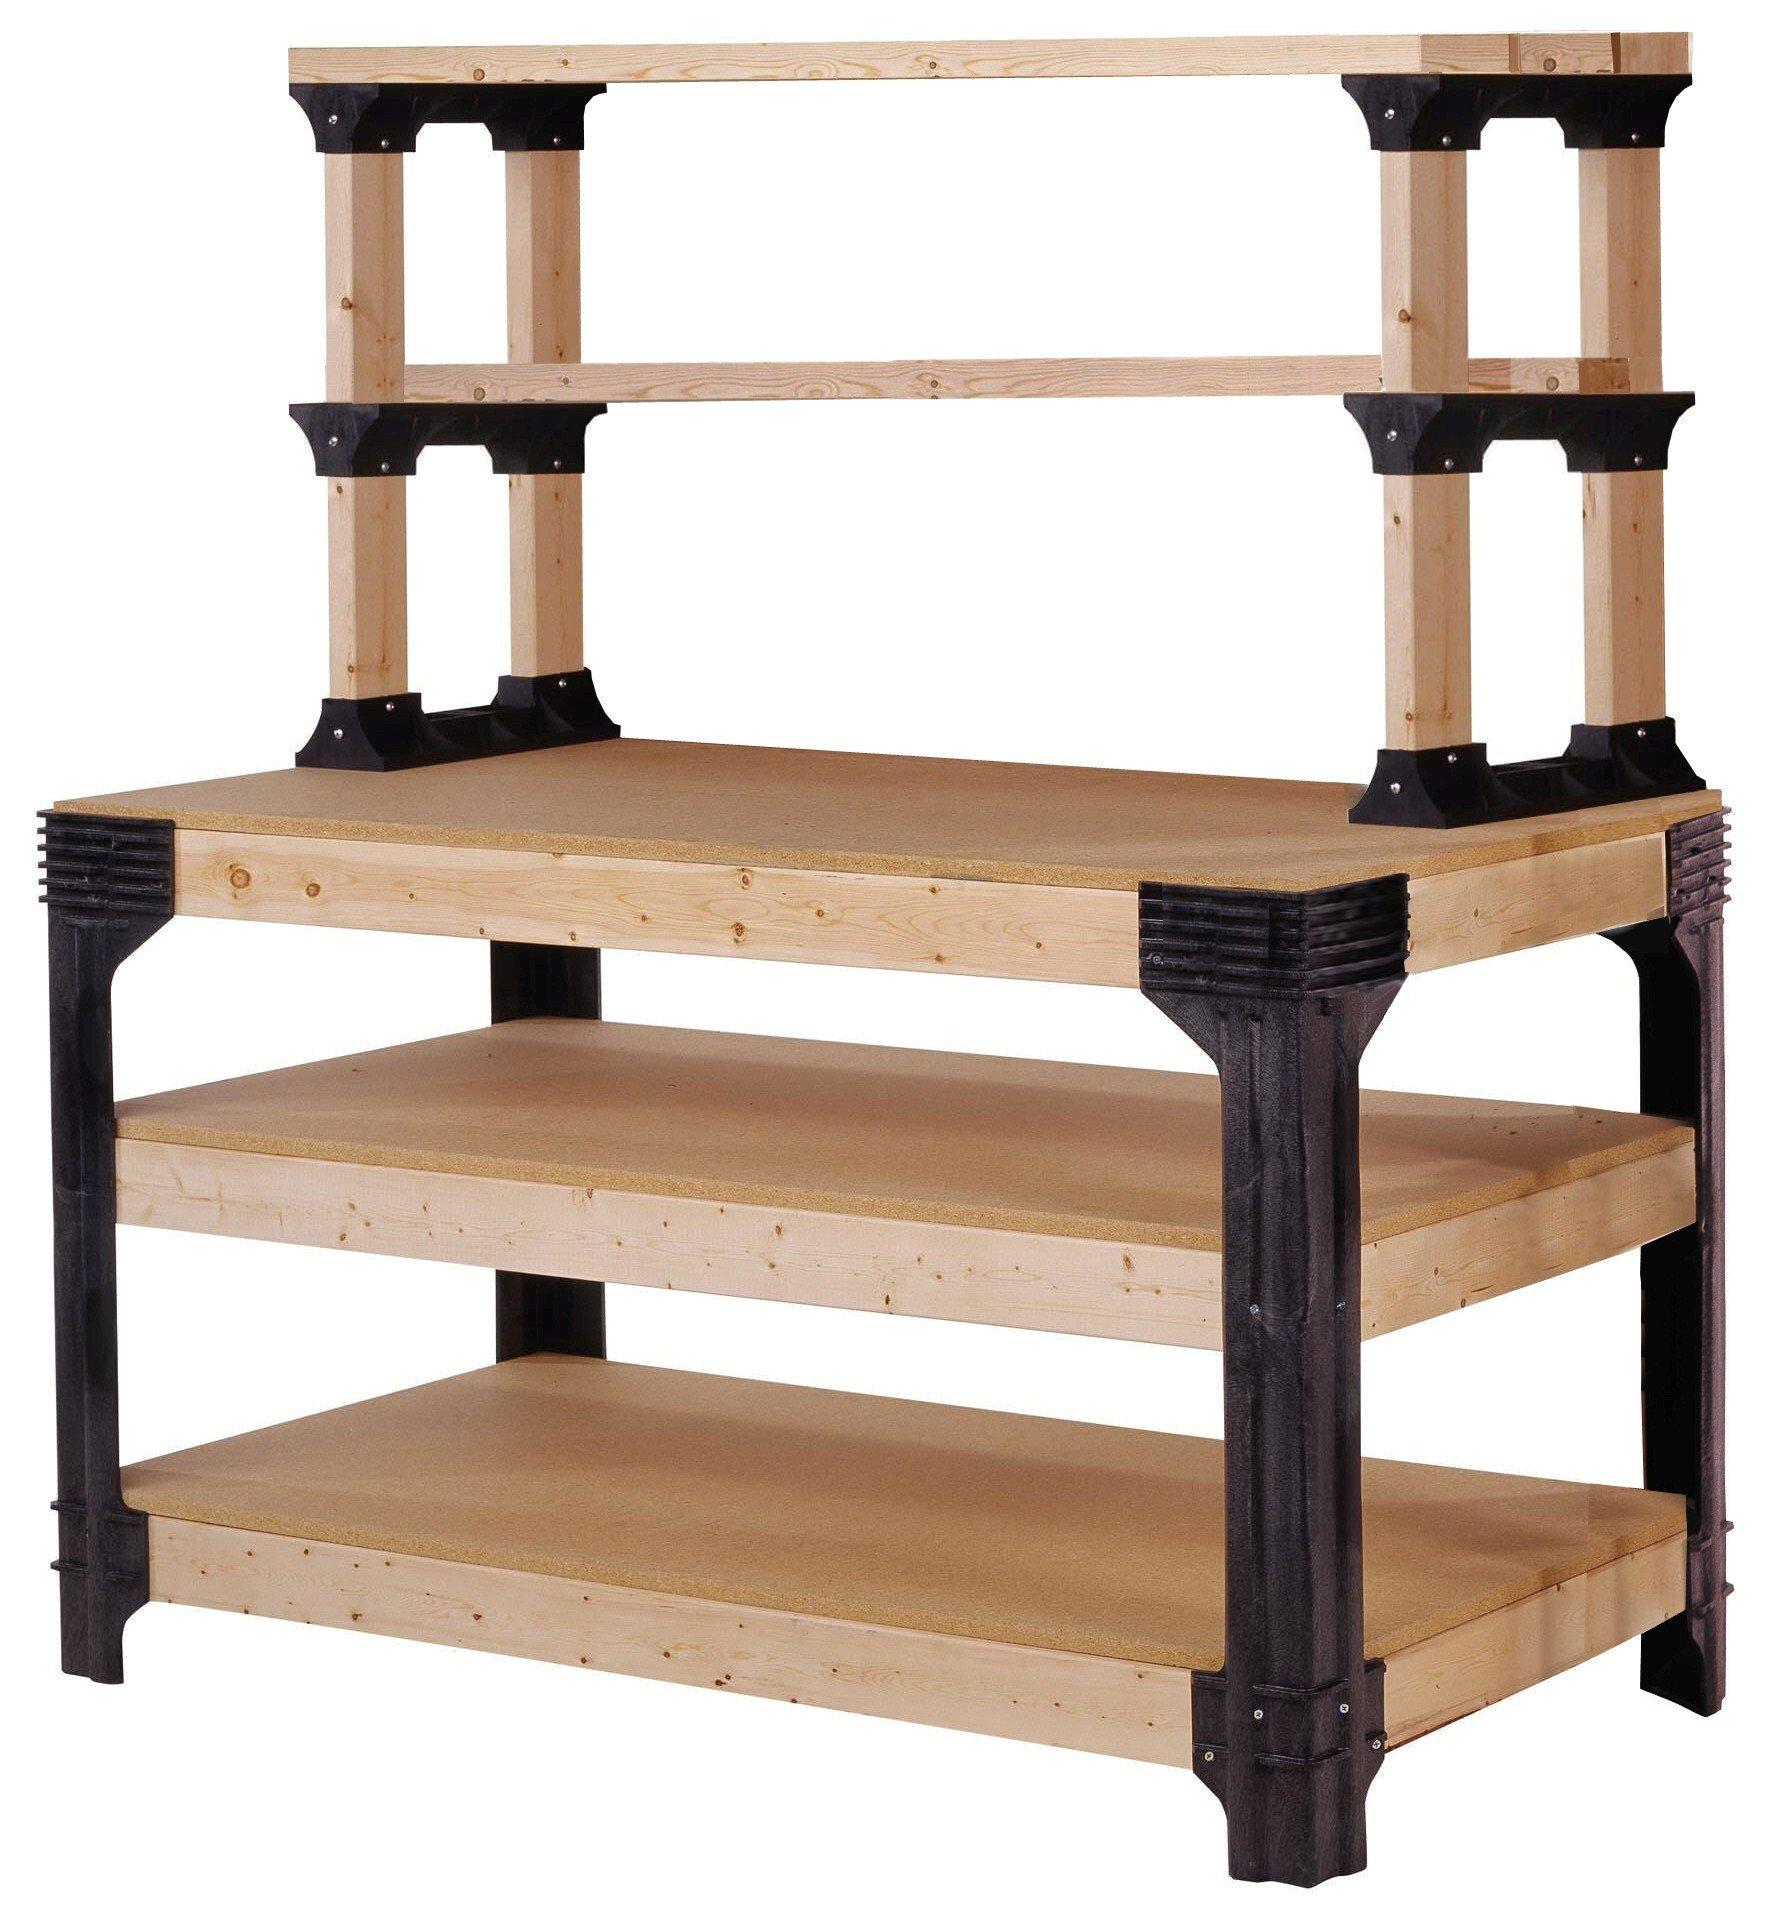 2x4basics 90164 Custom Work Bench and Shelving Storage System, Black by 2x4 basics